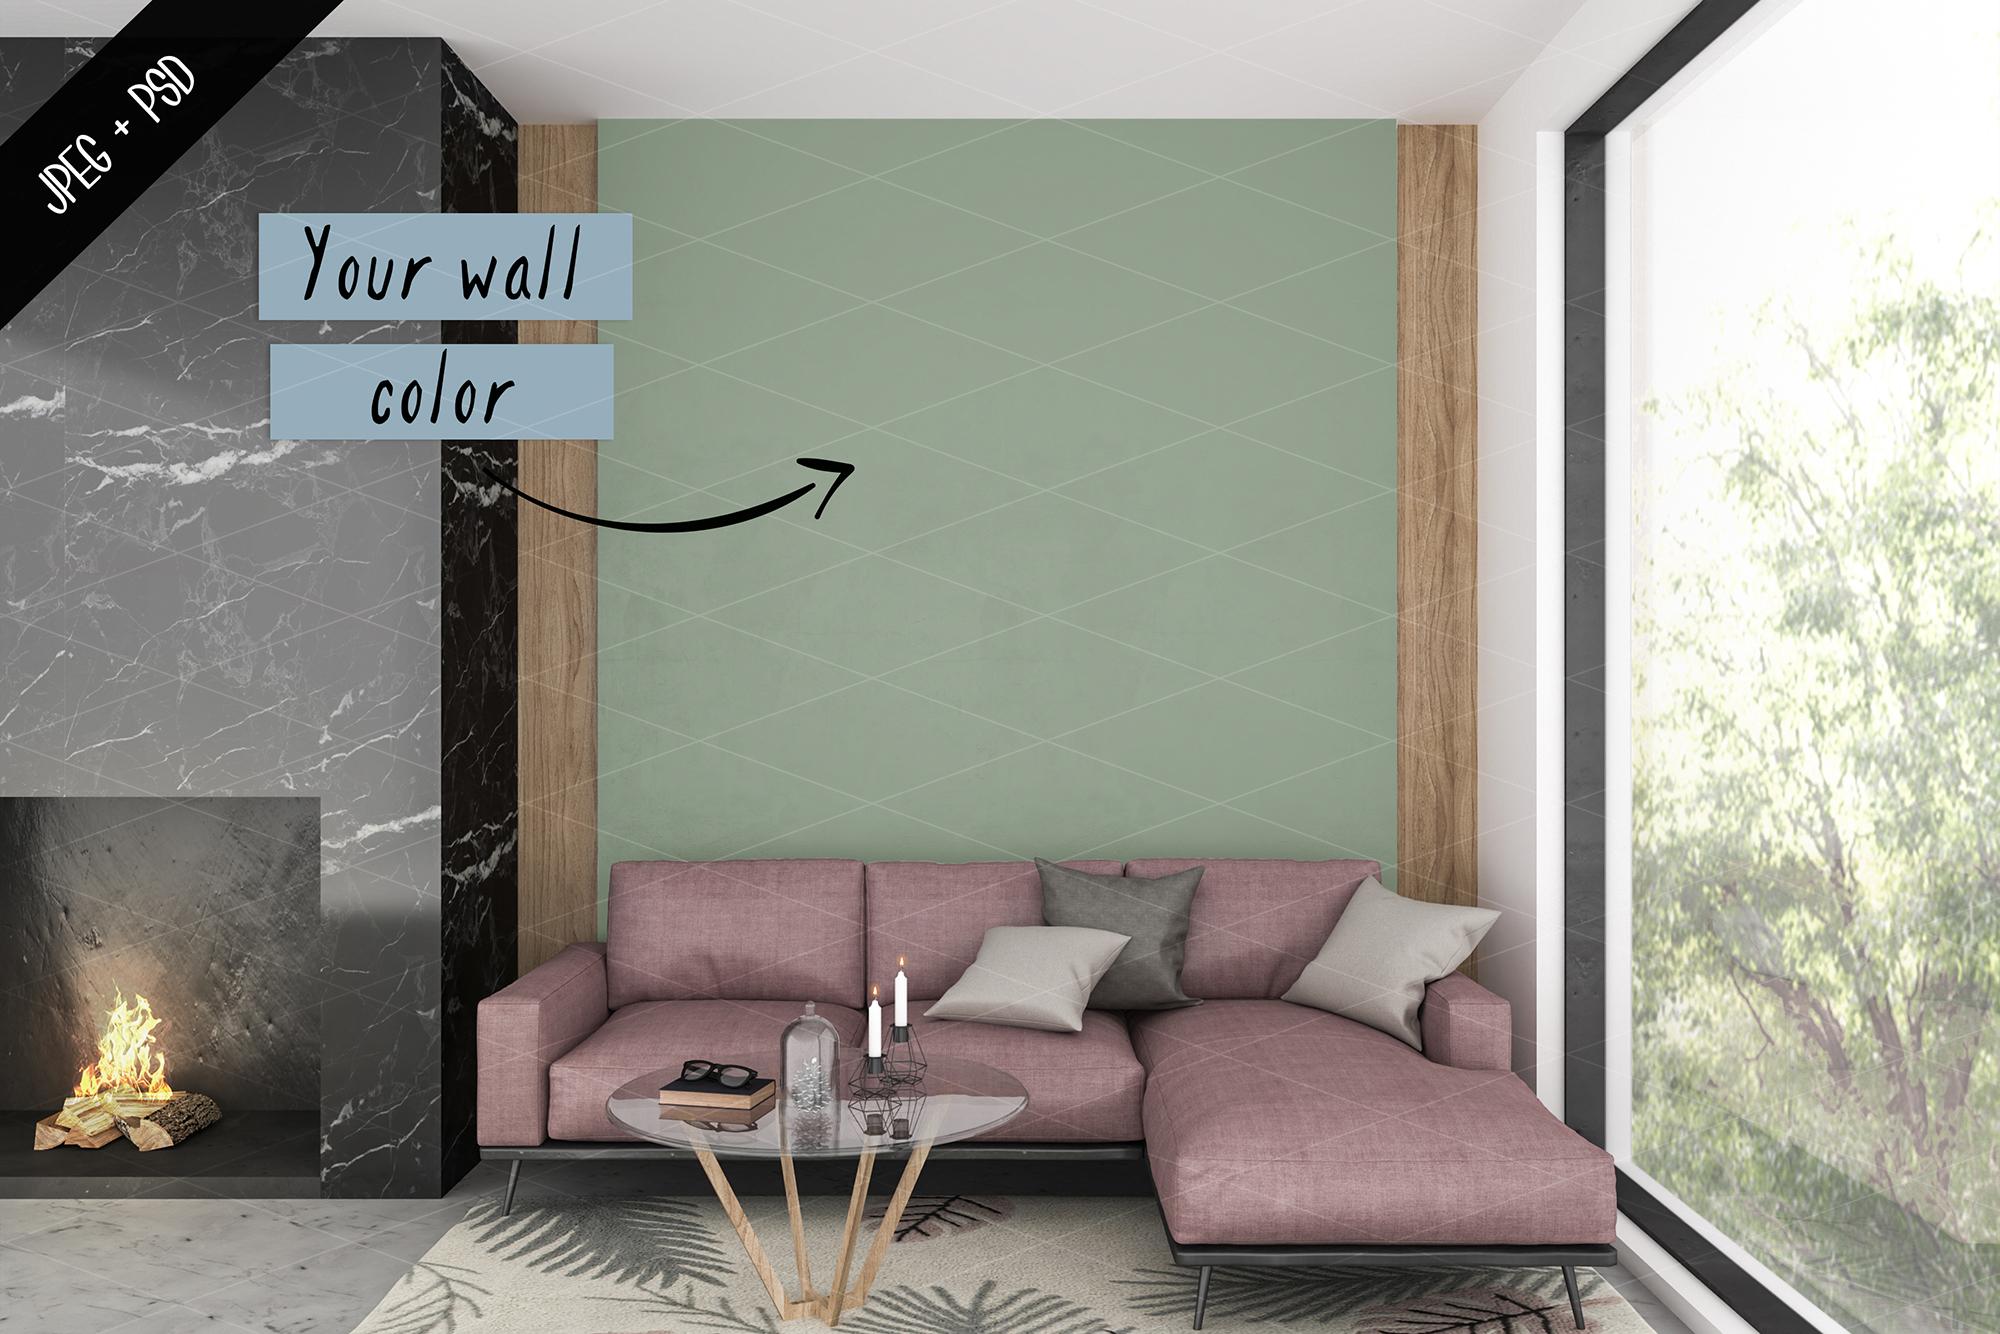 Frame mockup creator - All image size - Interior mockup example image 6